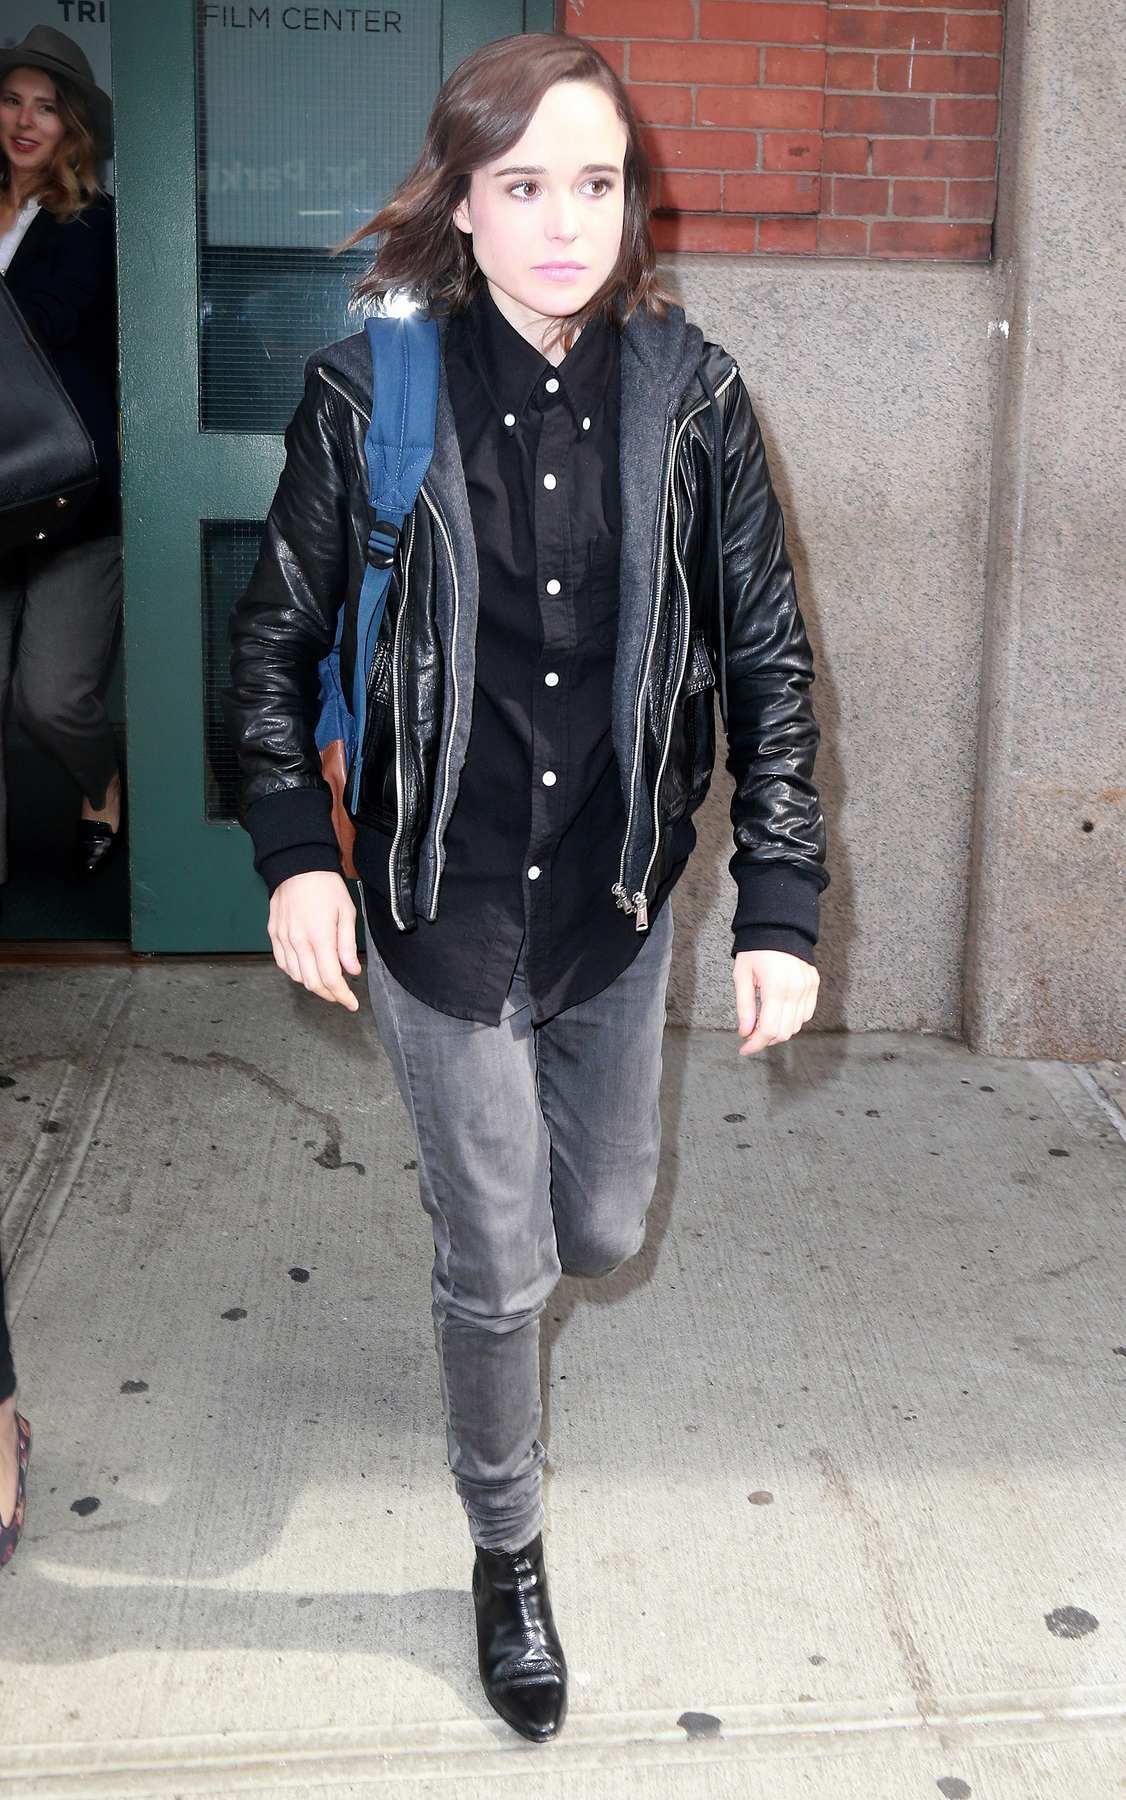 Ellen Page Leaving Tribeca Film Center-2